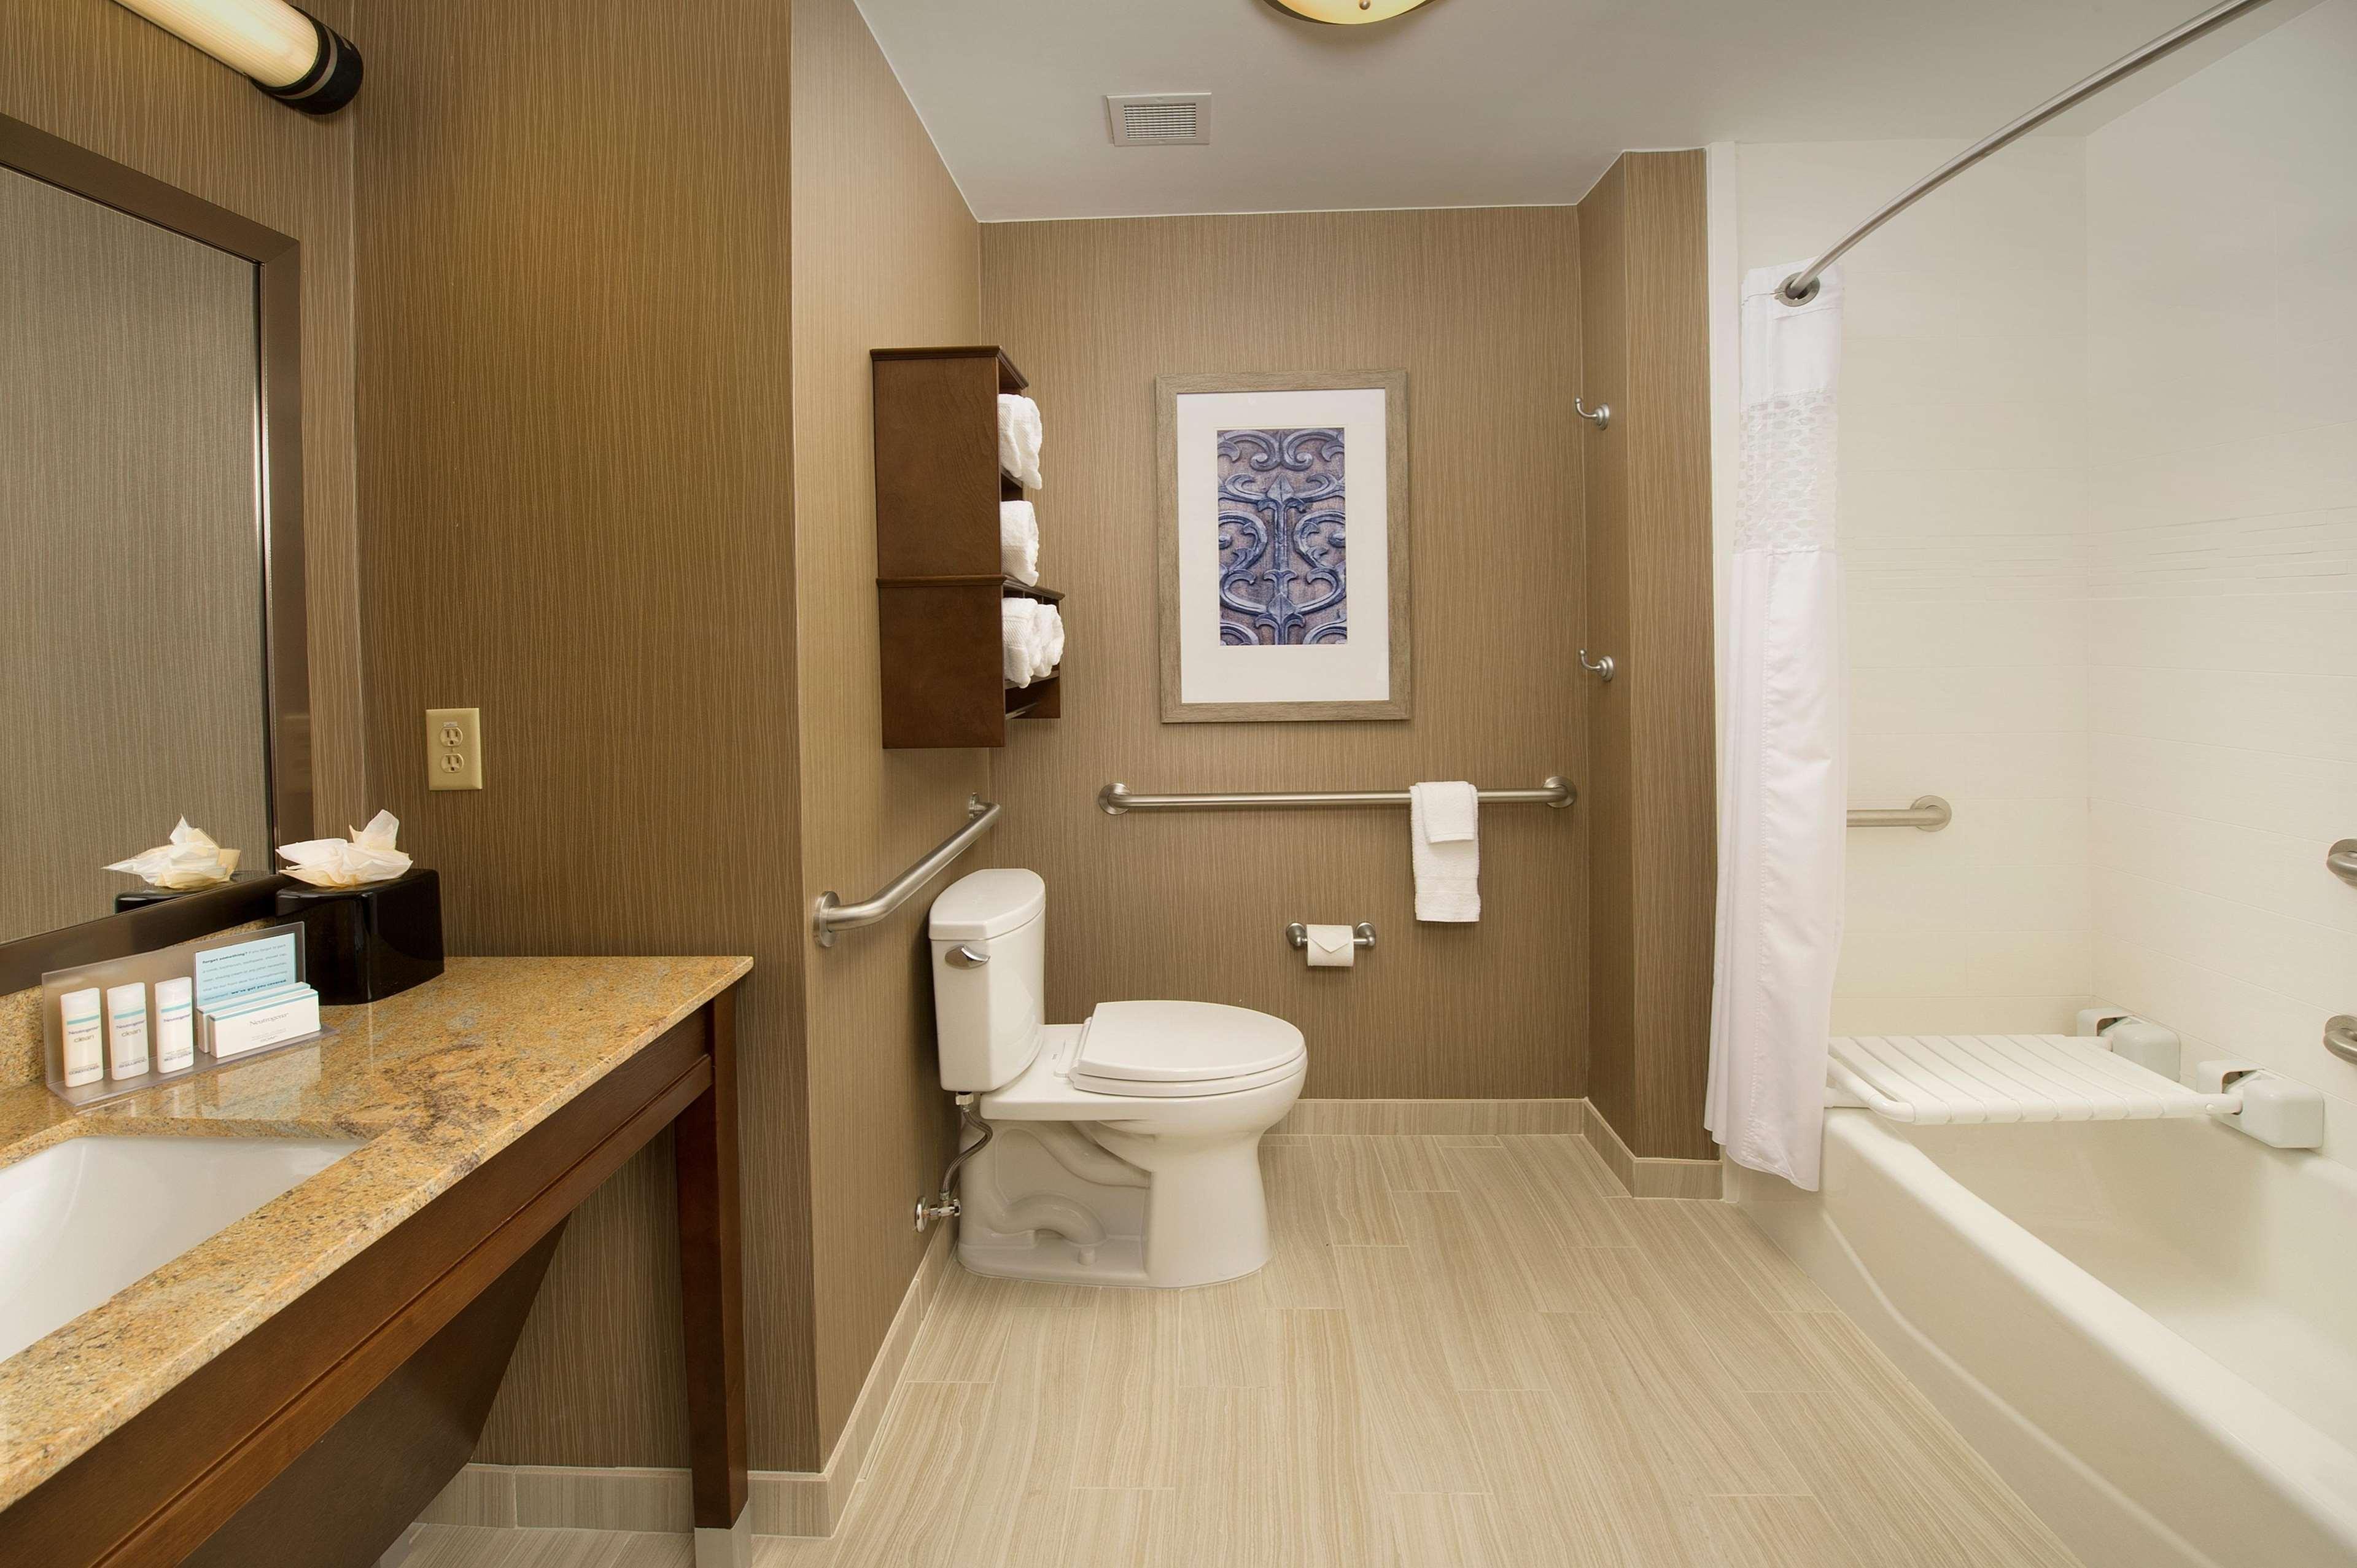 Hampton Inn & Suites San Antonio-Downtown/Market Square image 15